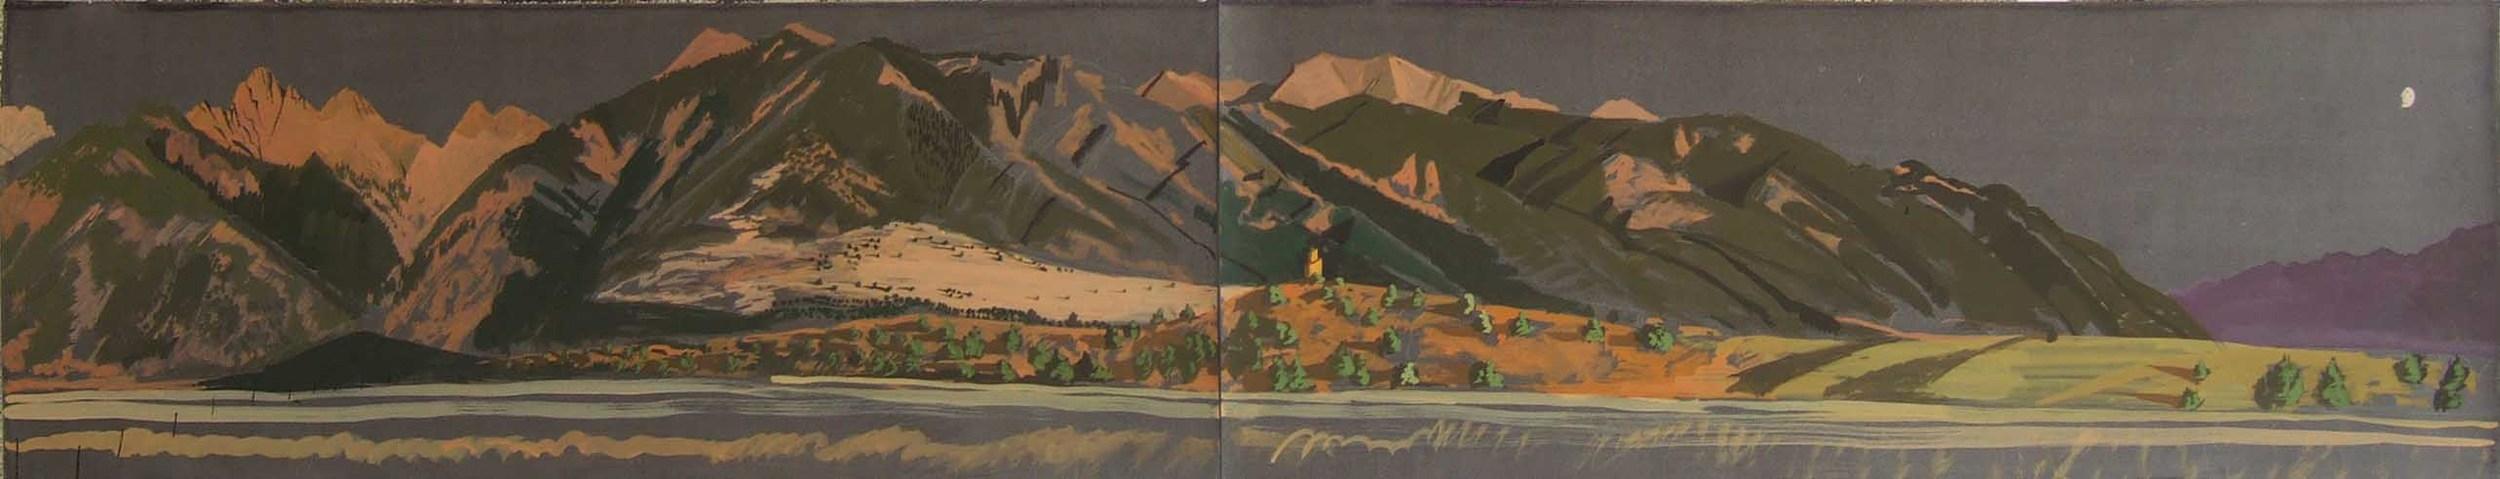 "crestone peak with moonlight  18x72"""